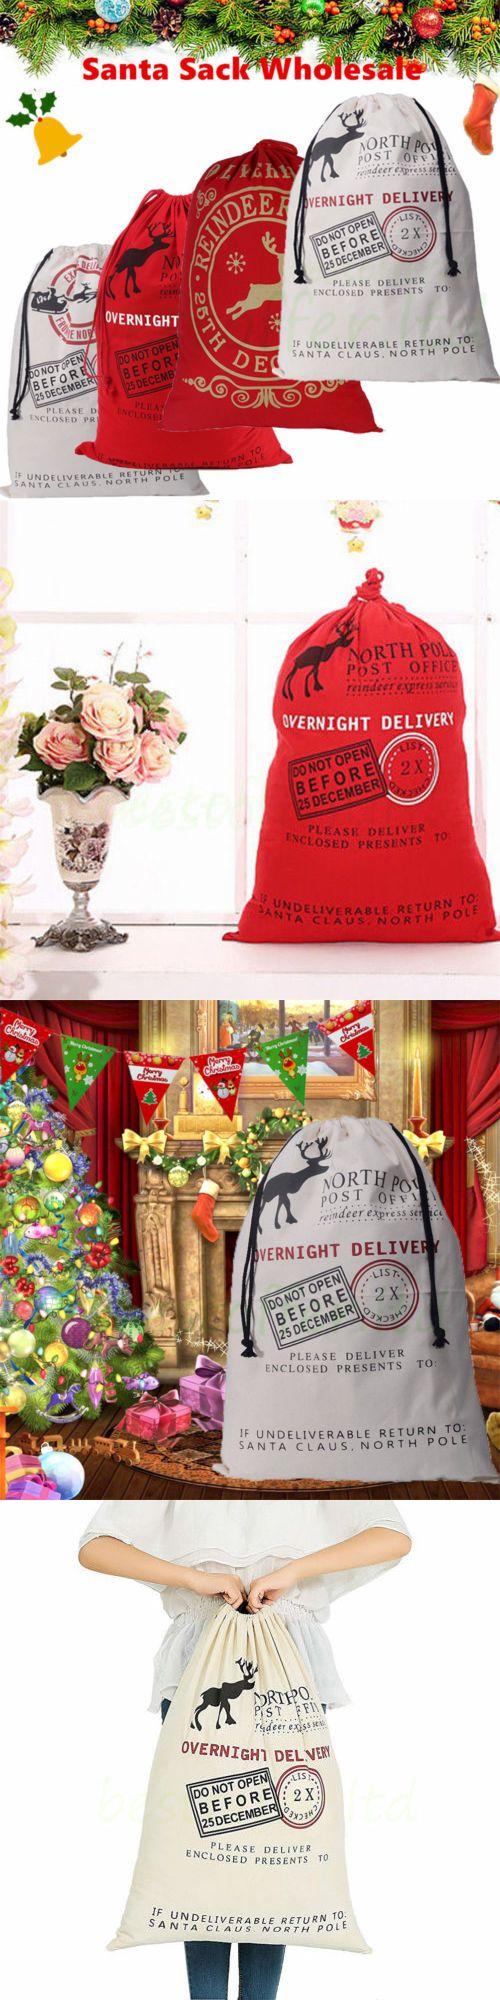 Christmas Decorations: Wholesale 5 10Pc Christmas Santa Claus Sack Large Stocking Bag Hessian Xmas Gift -> BUY IT NOW ONLY: $44.37 on eBay!